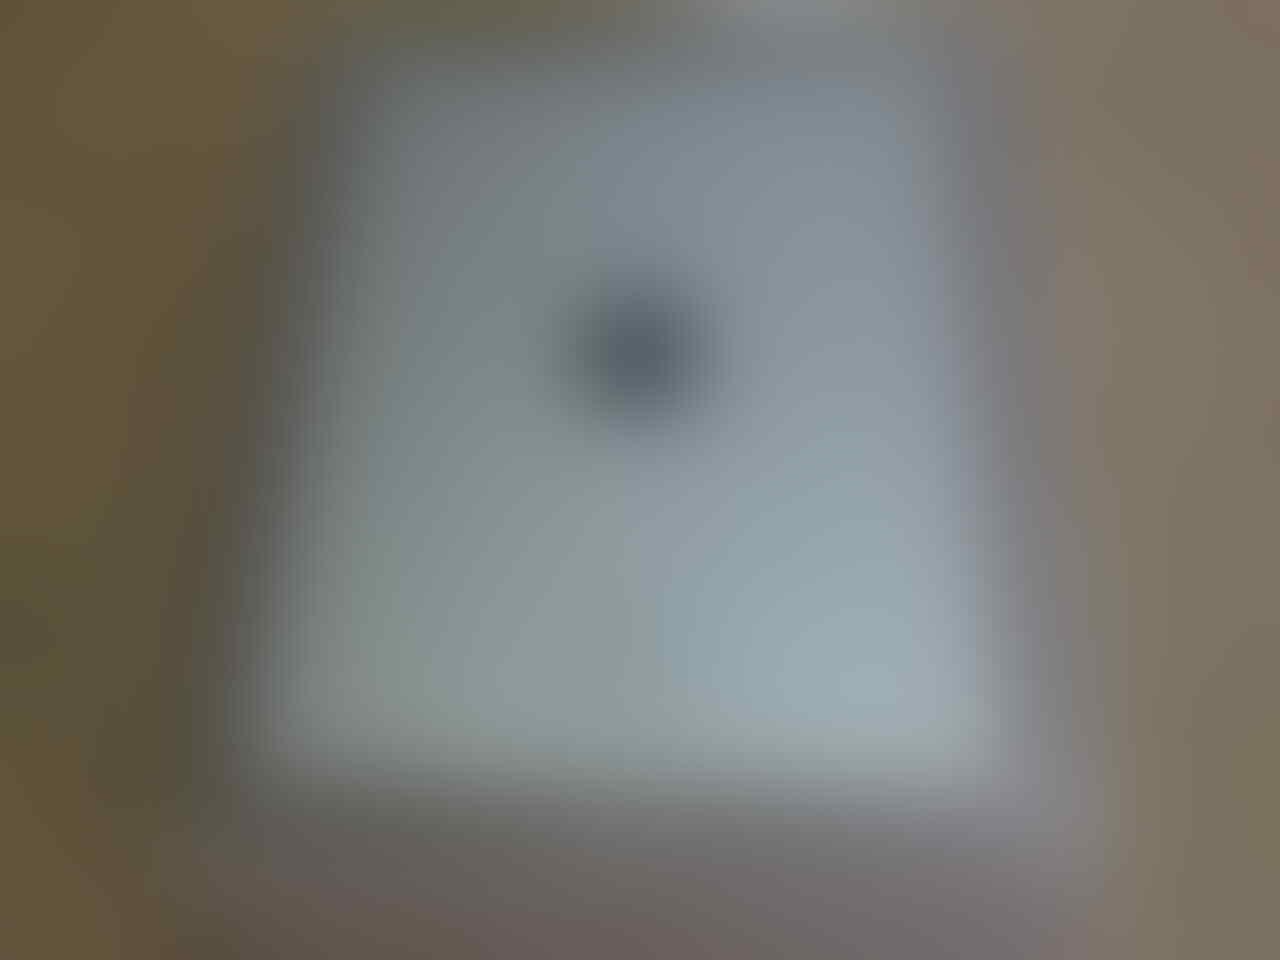 jual iPad 2 16GB Wifi+3G Model.....kondisi mulus